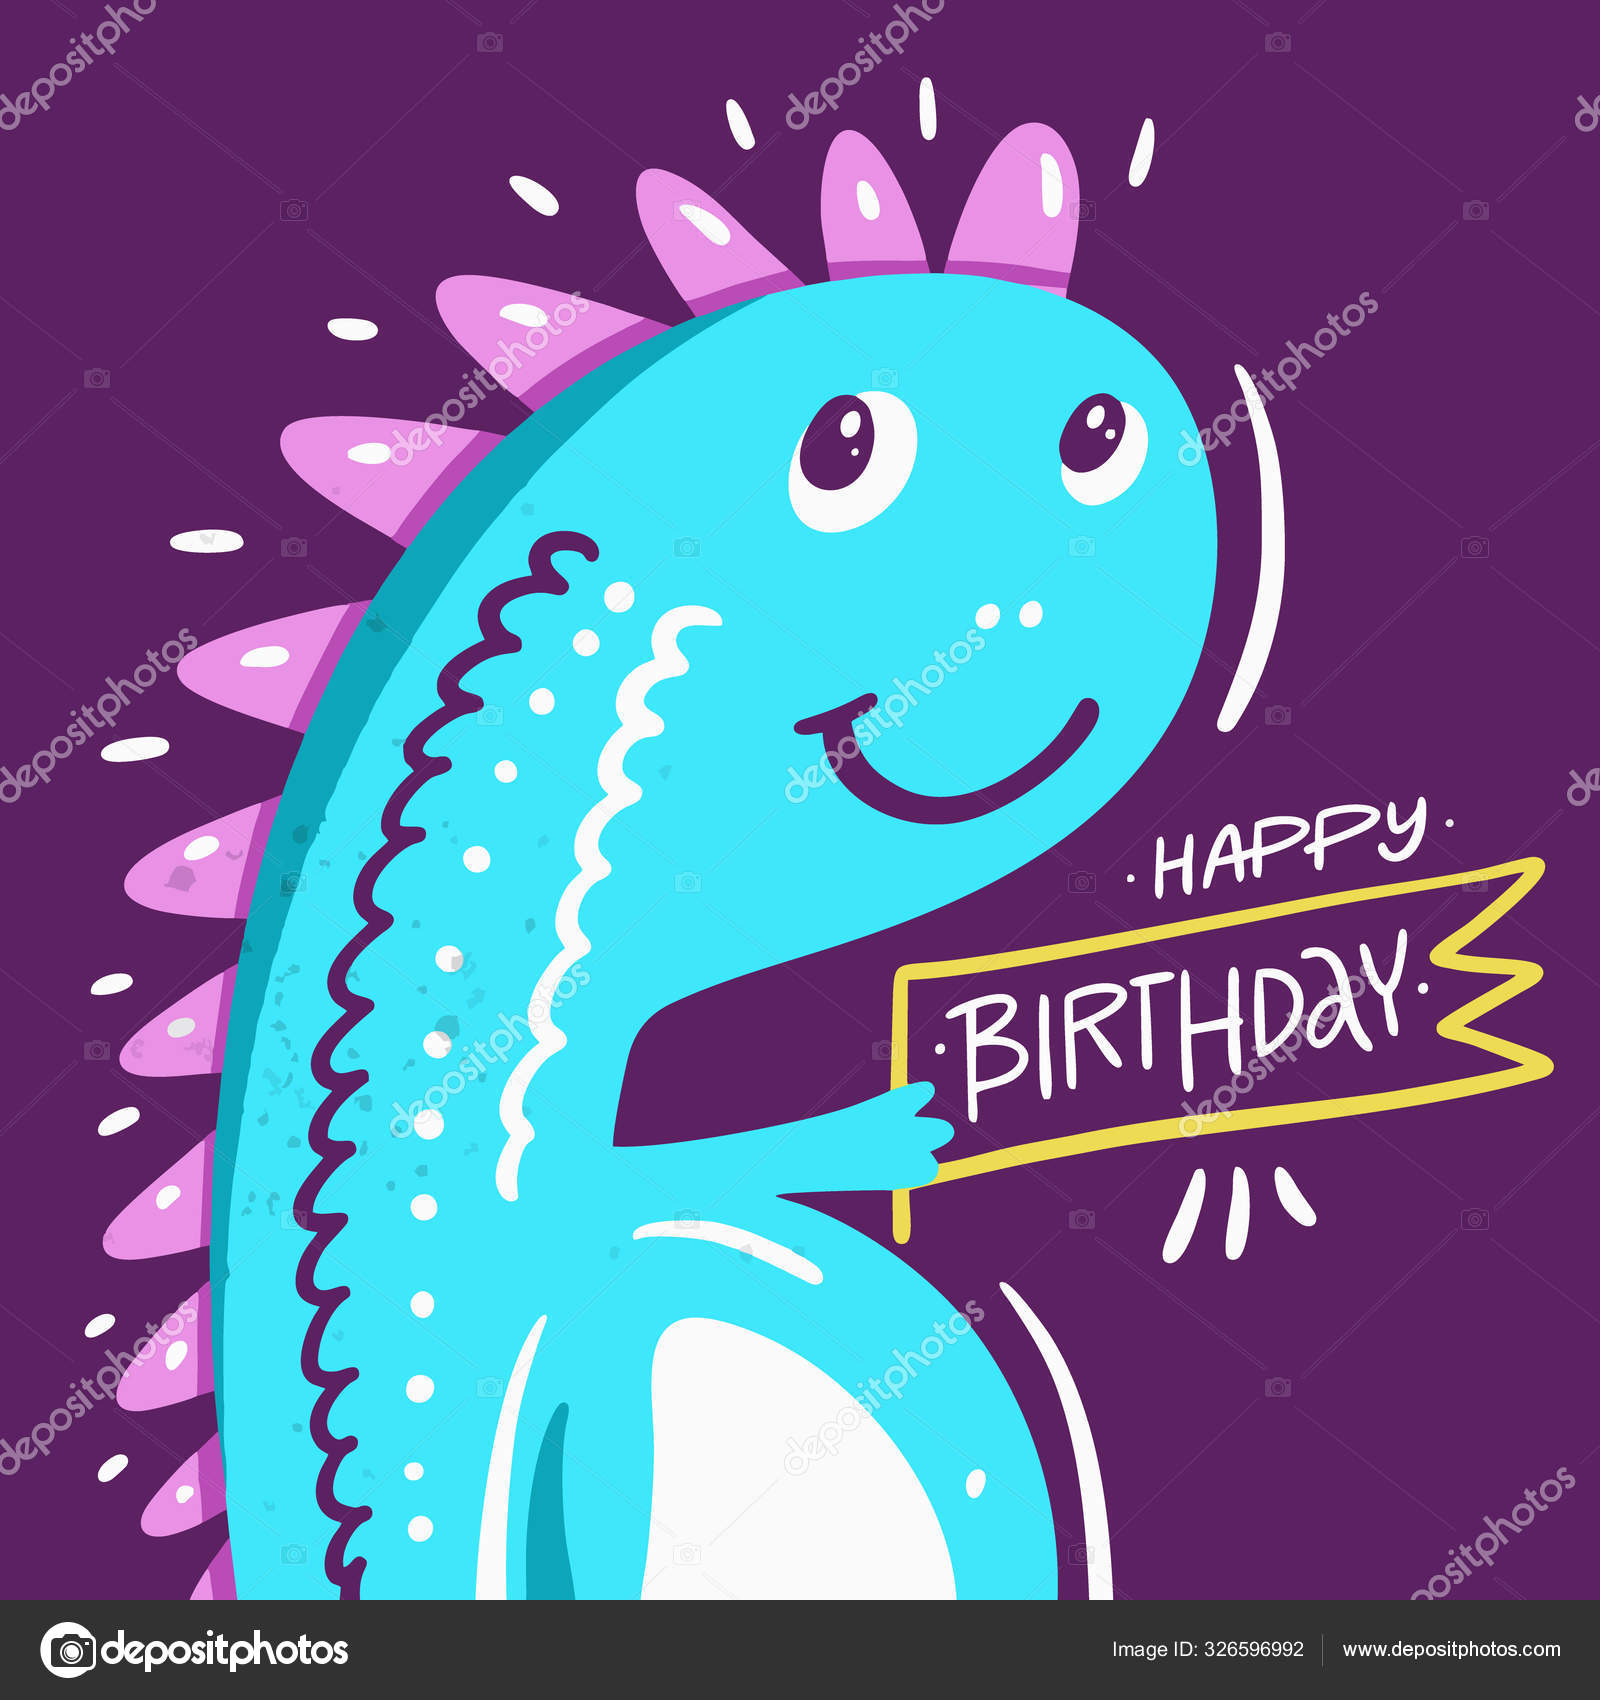 depositphotos stock illustration dinosaur and happy birthday phrase